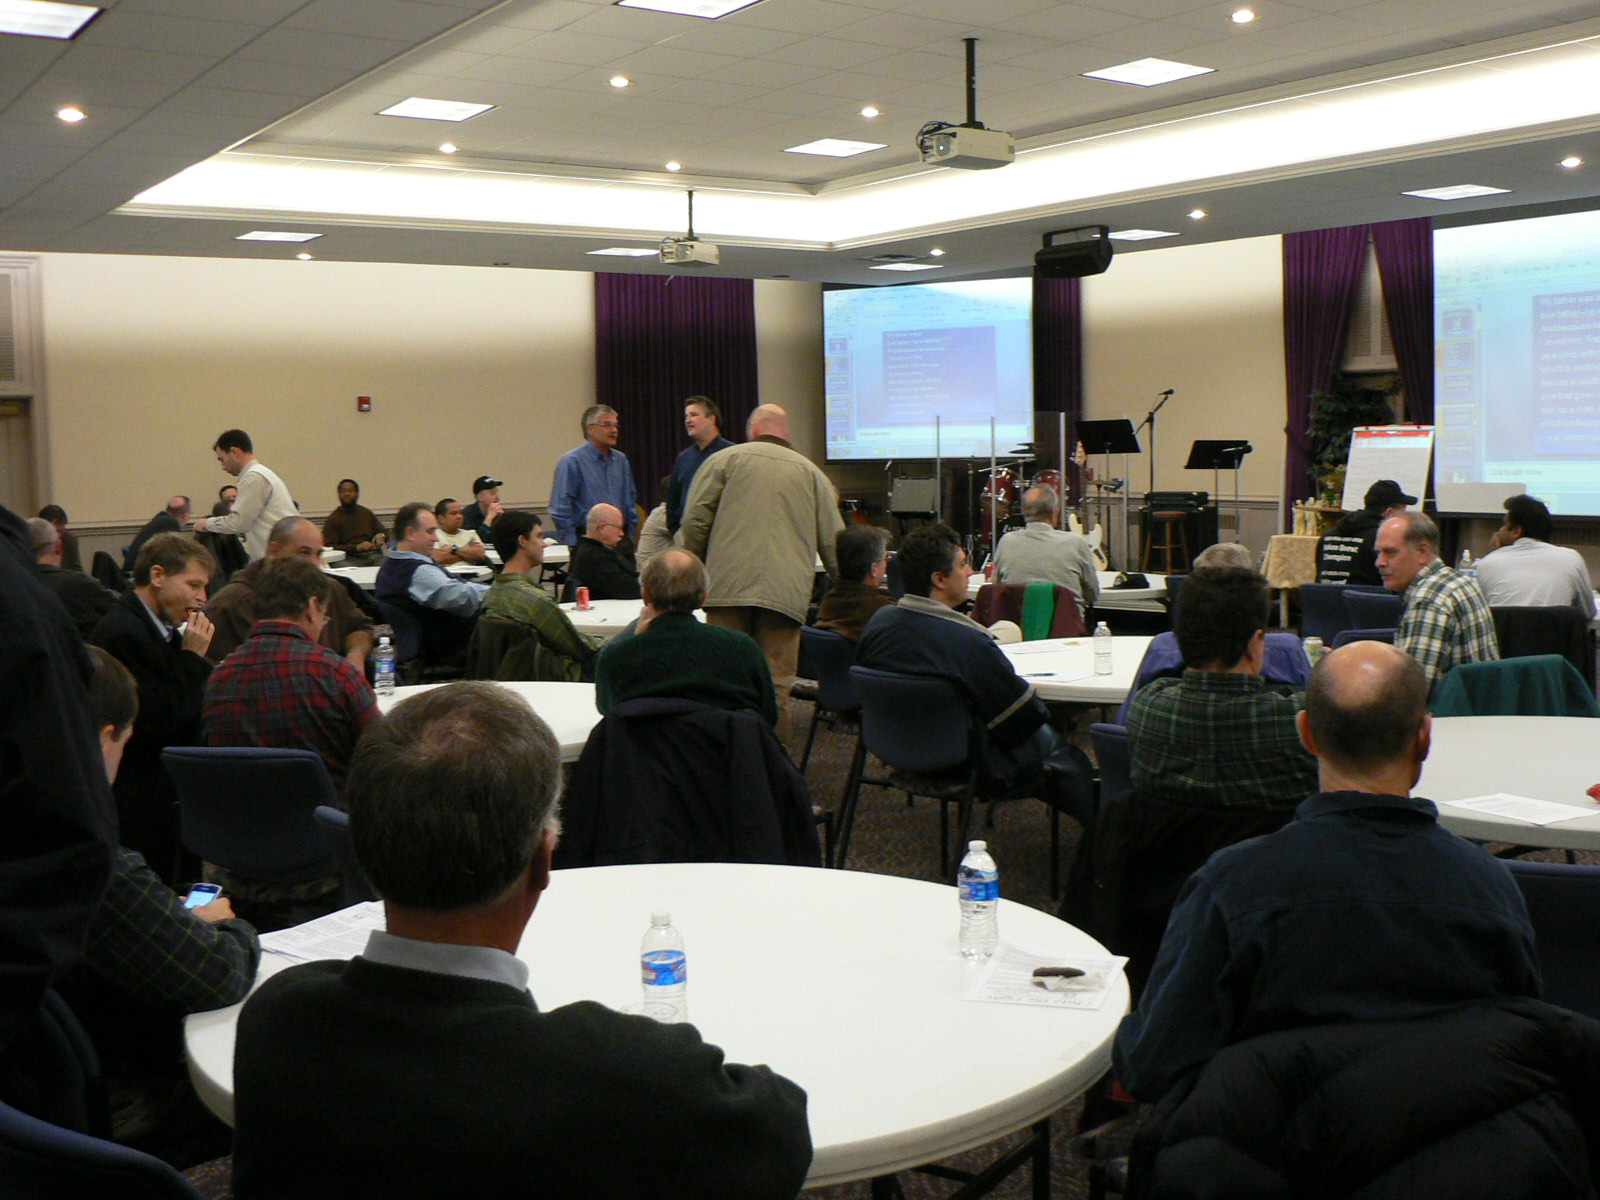 2014, Fathers' Workshop, Richmond Virginia.